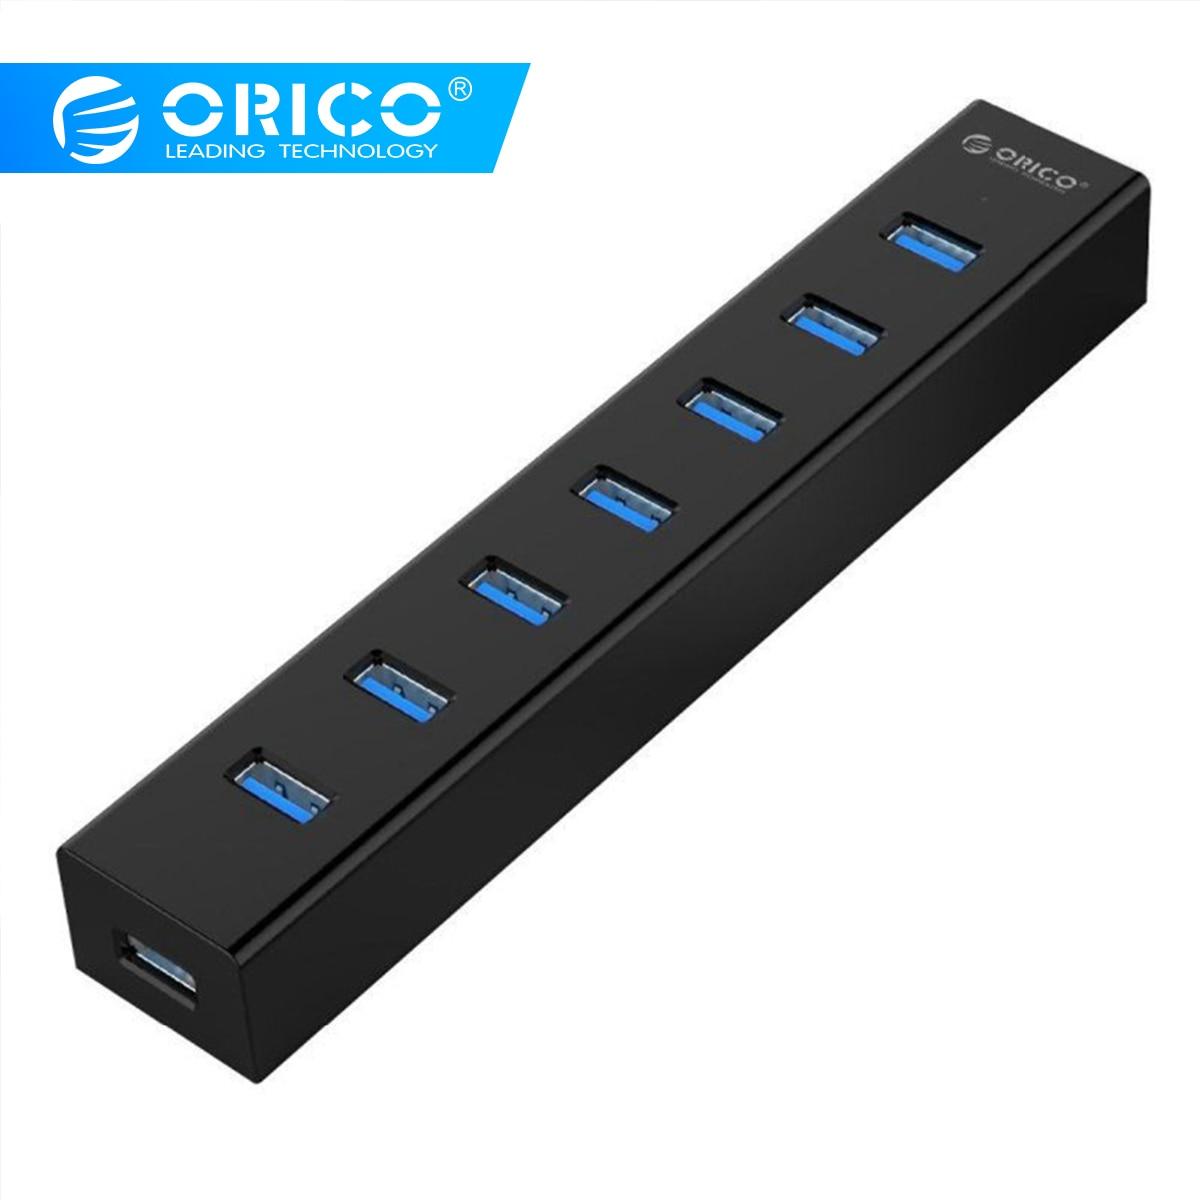 ORICO H7013-U3 Super Speed ABS USB 3.0 7 Ports HUB-Black/Red/White/Yellow